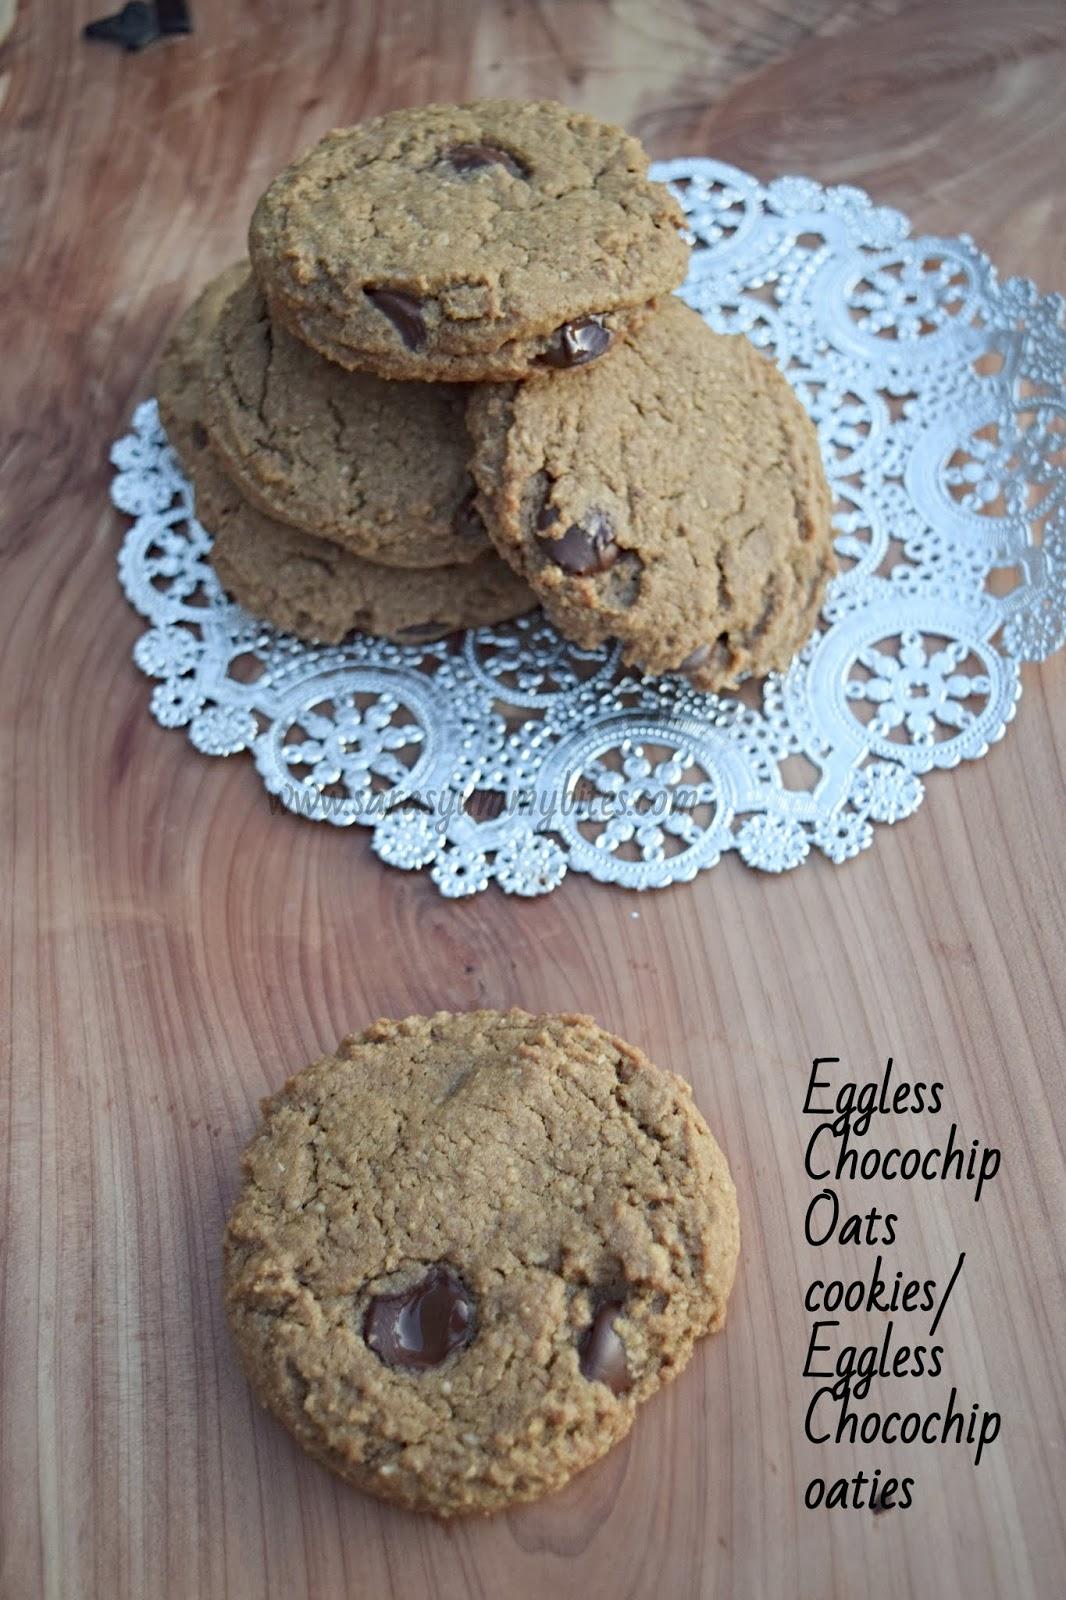 Eggless Chocochip Oats cookies/ Eggless Chocochip oaties